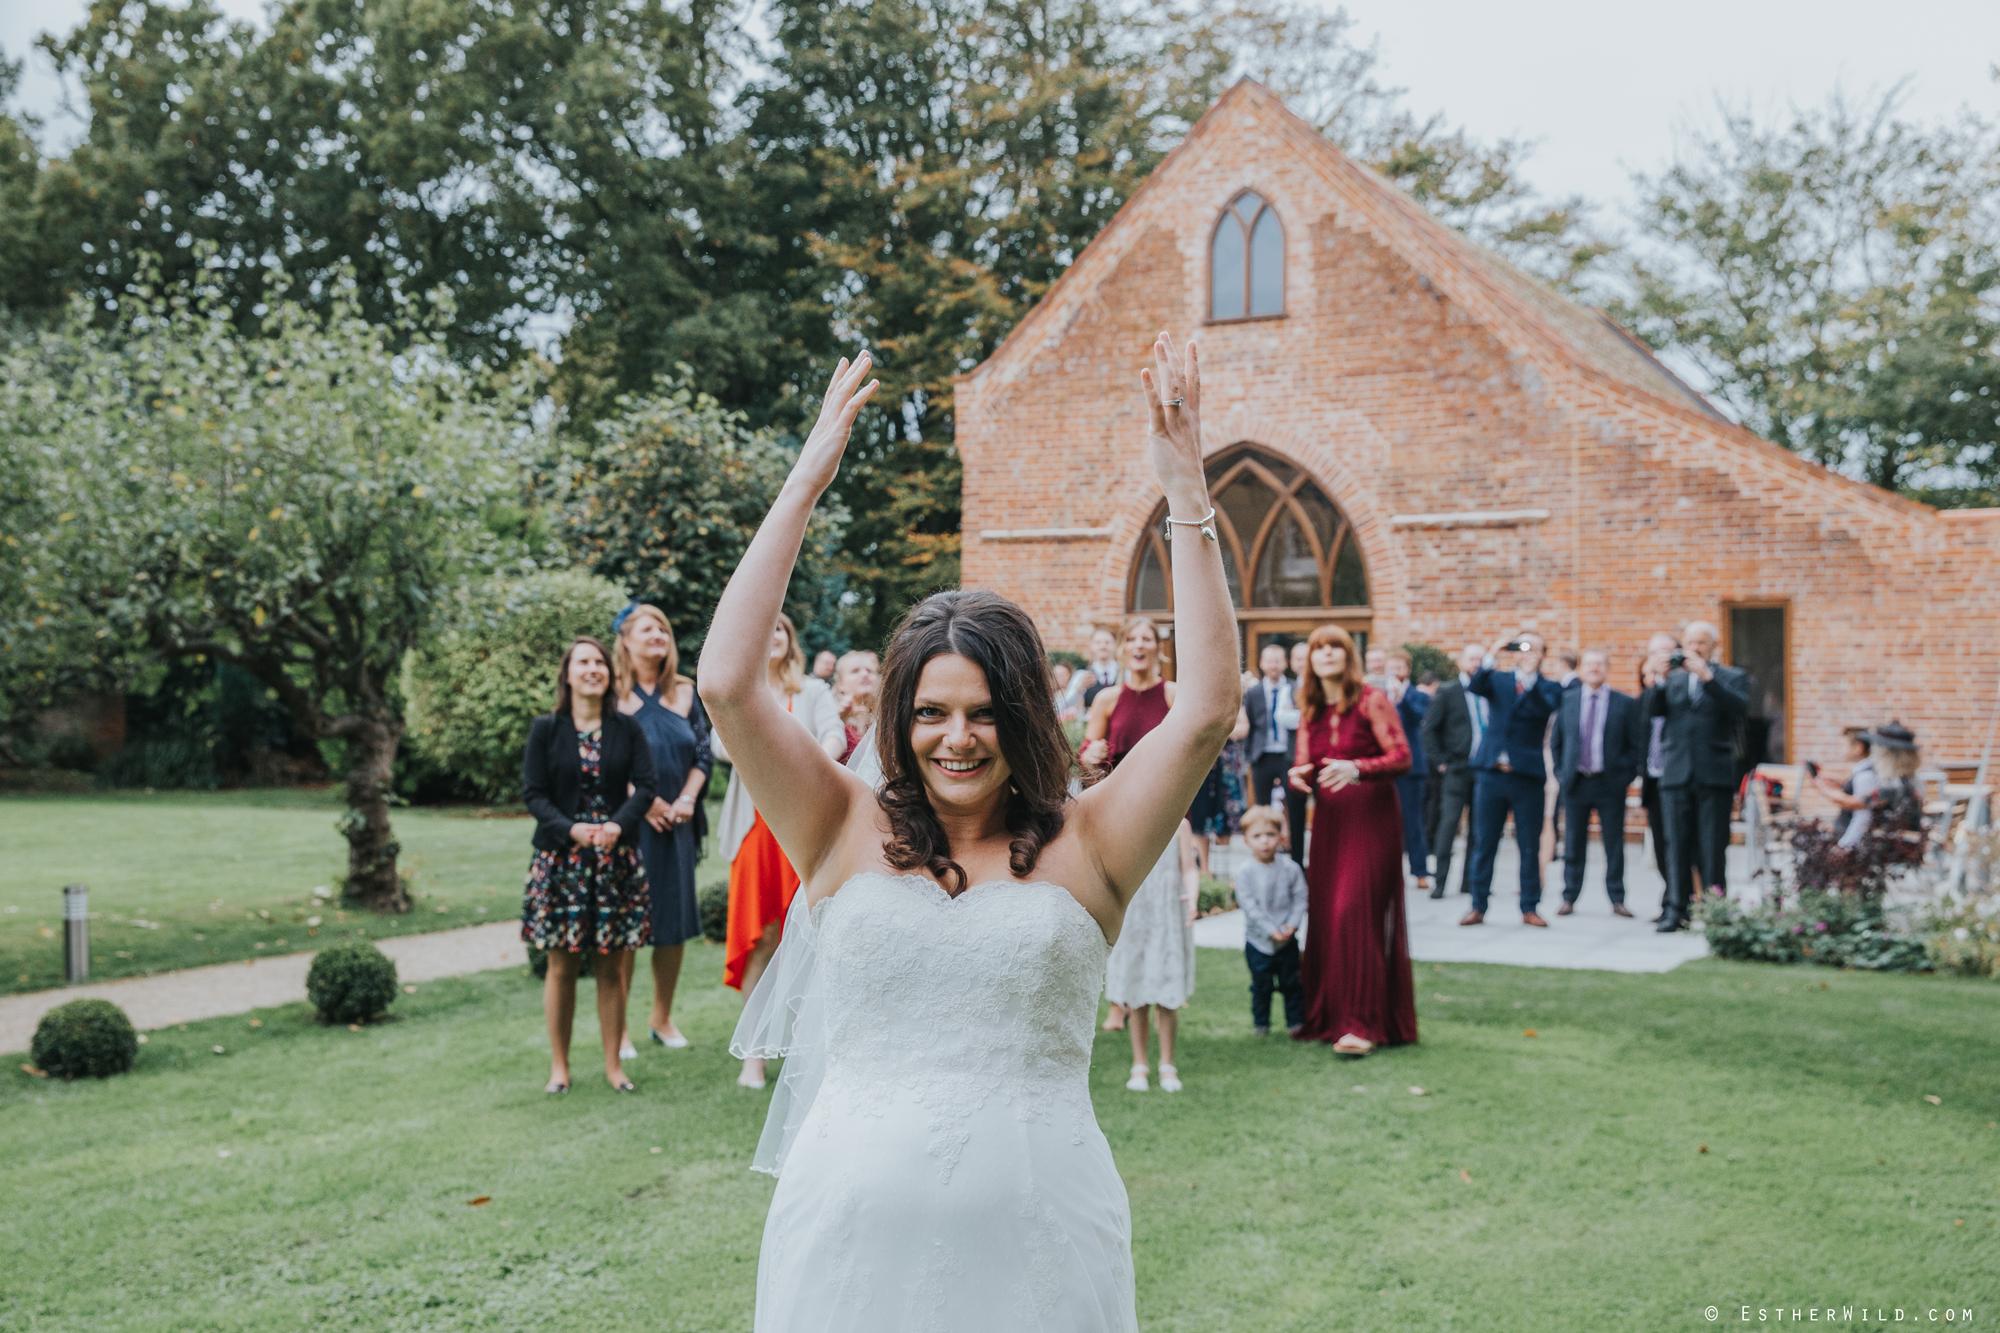 Reading_Room_Weddings_Alby_Norwich_Photographer_Esther_Wild_IMG_1620.jpg